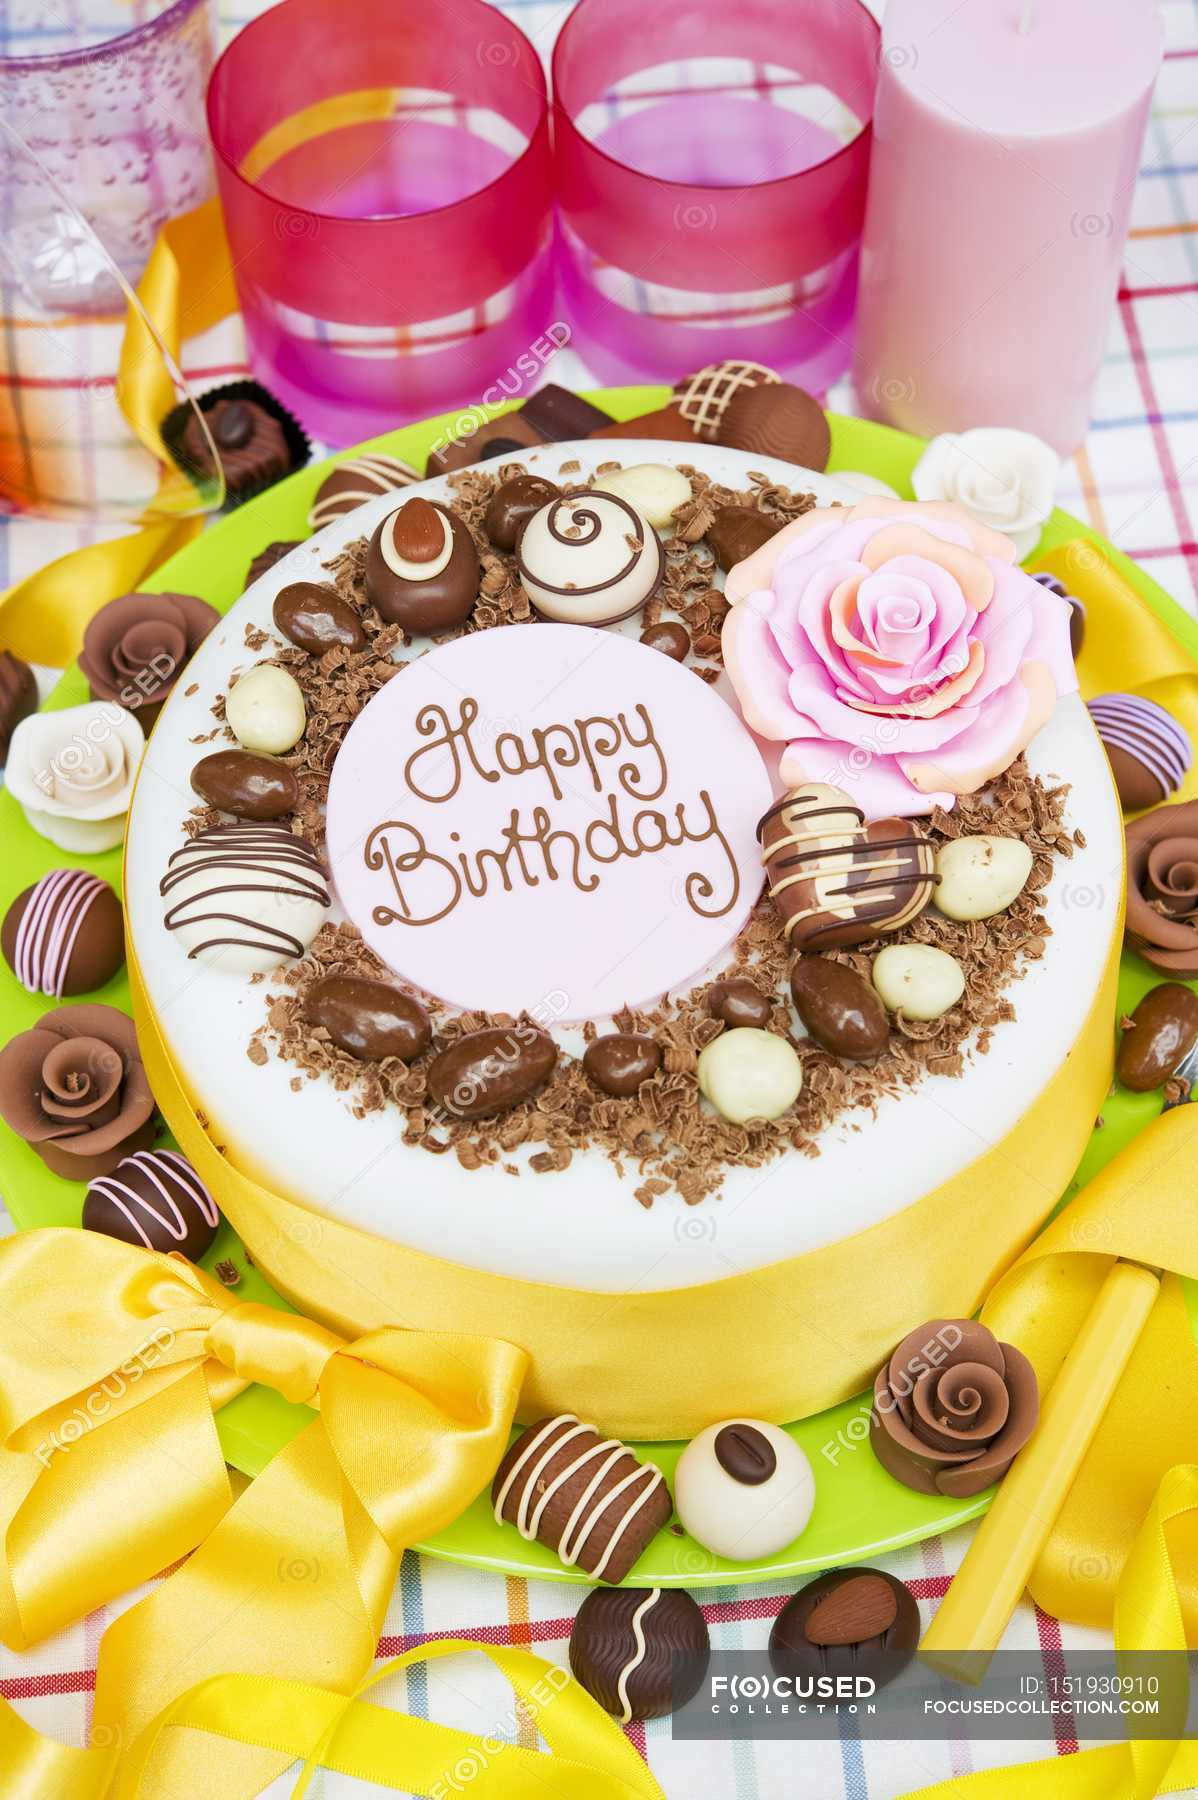 Birthday Cake With Chocolate Candies Stock Photo 151930910